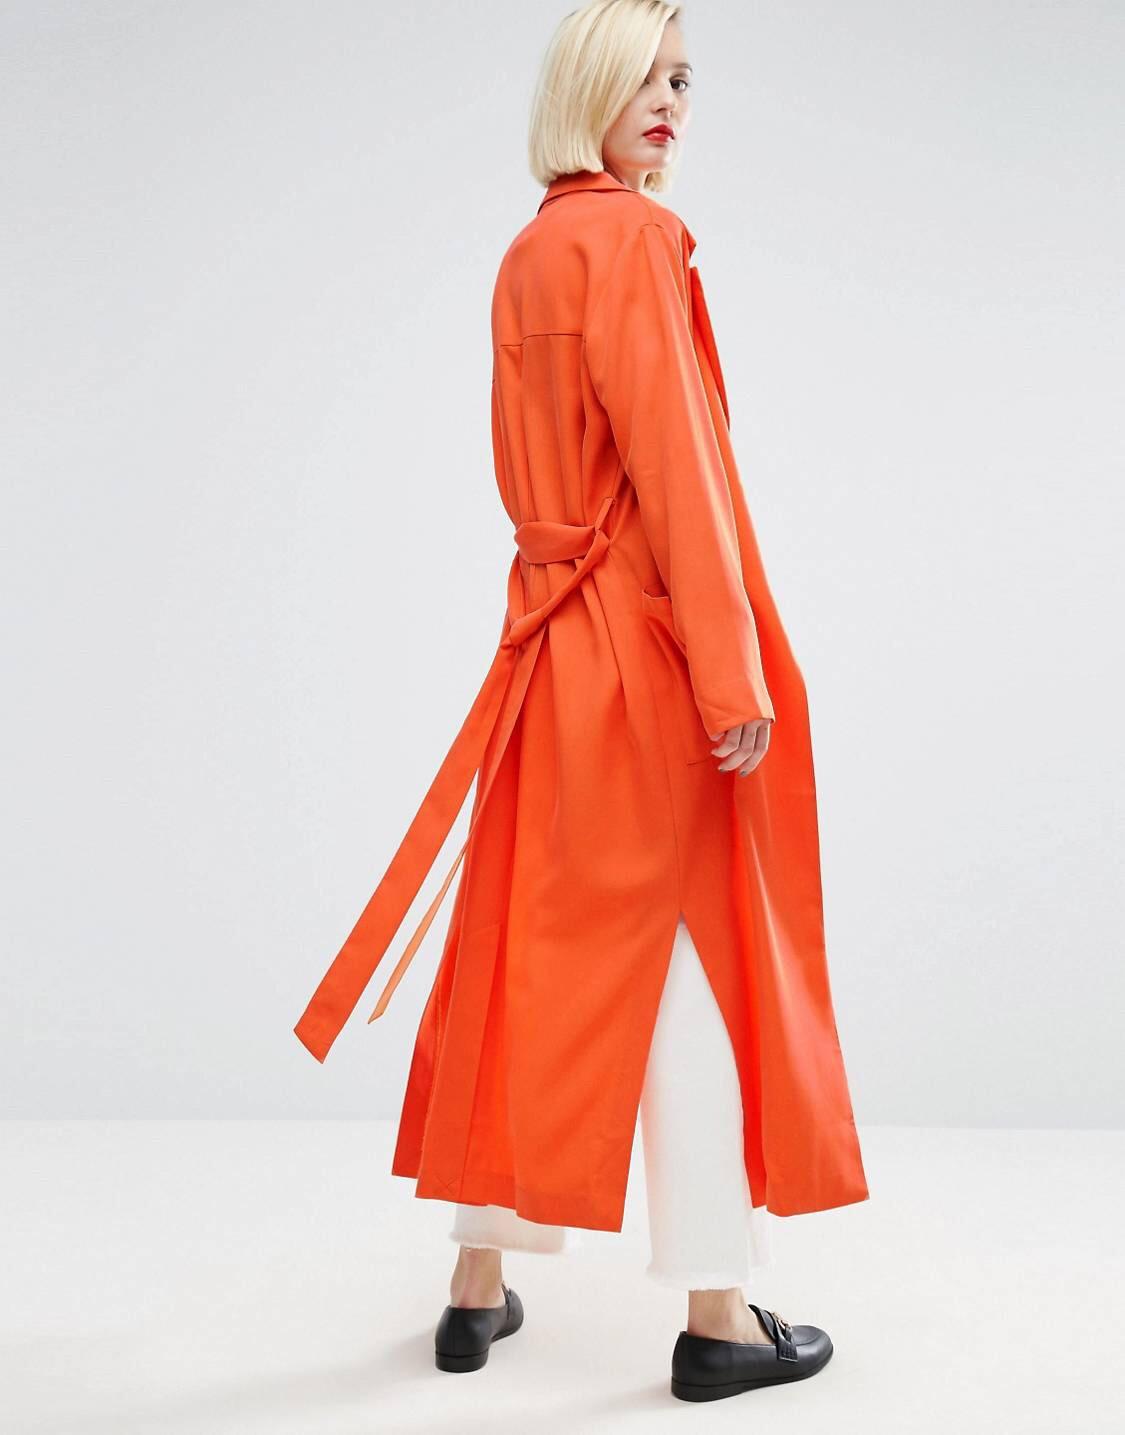 £30 ASOS Soft Drape Kimono - Erm, This is a duster, but okayyy.